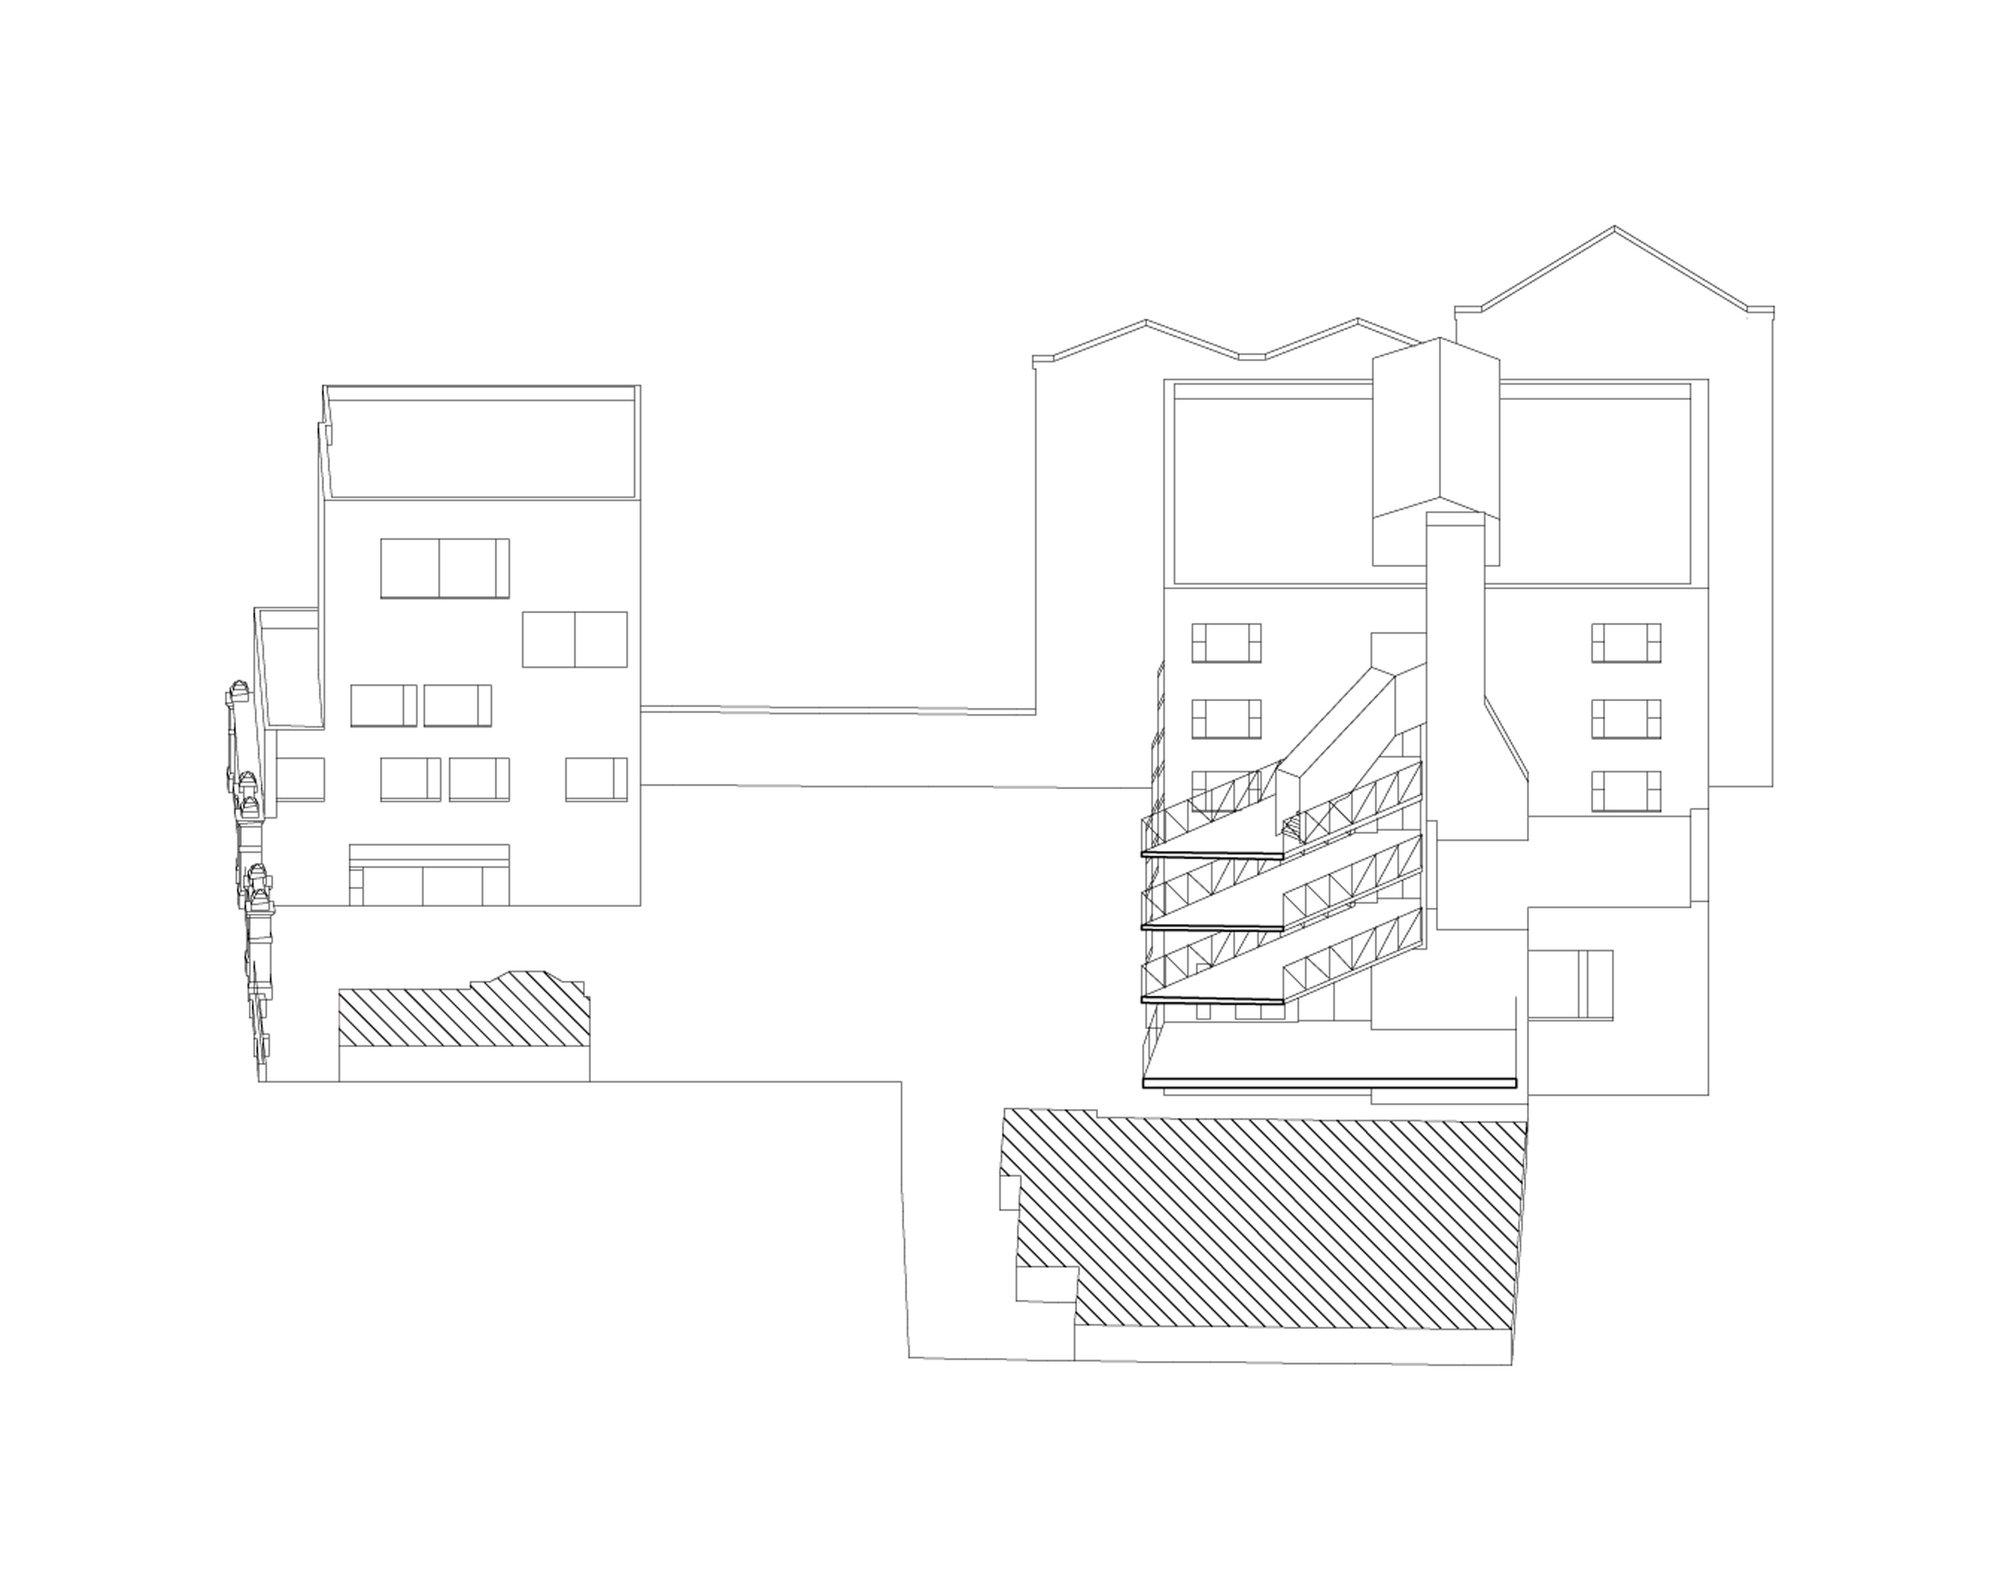 Hackney New School ← Works ← Henley Halebrown